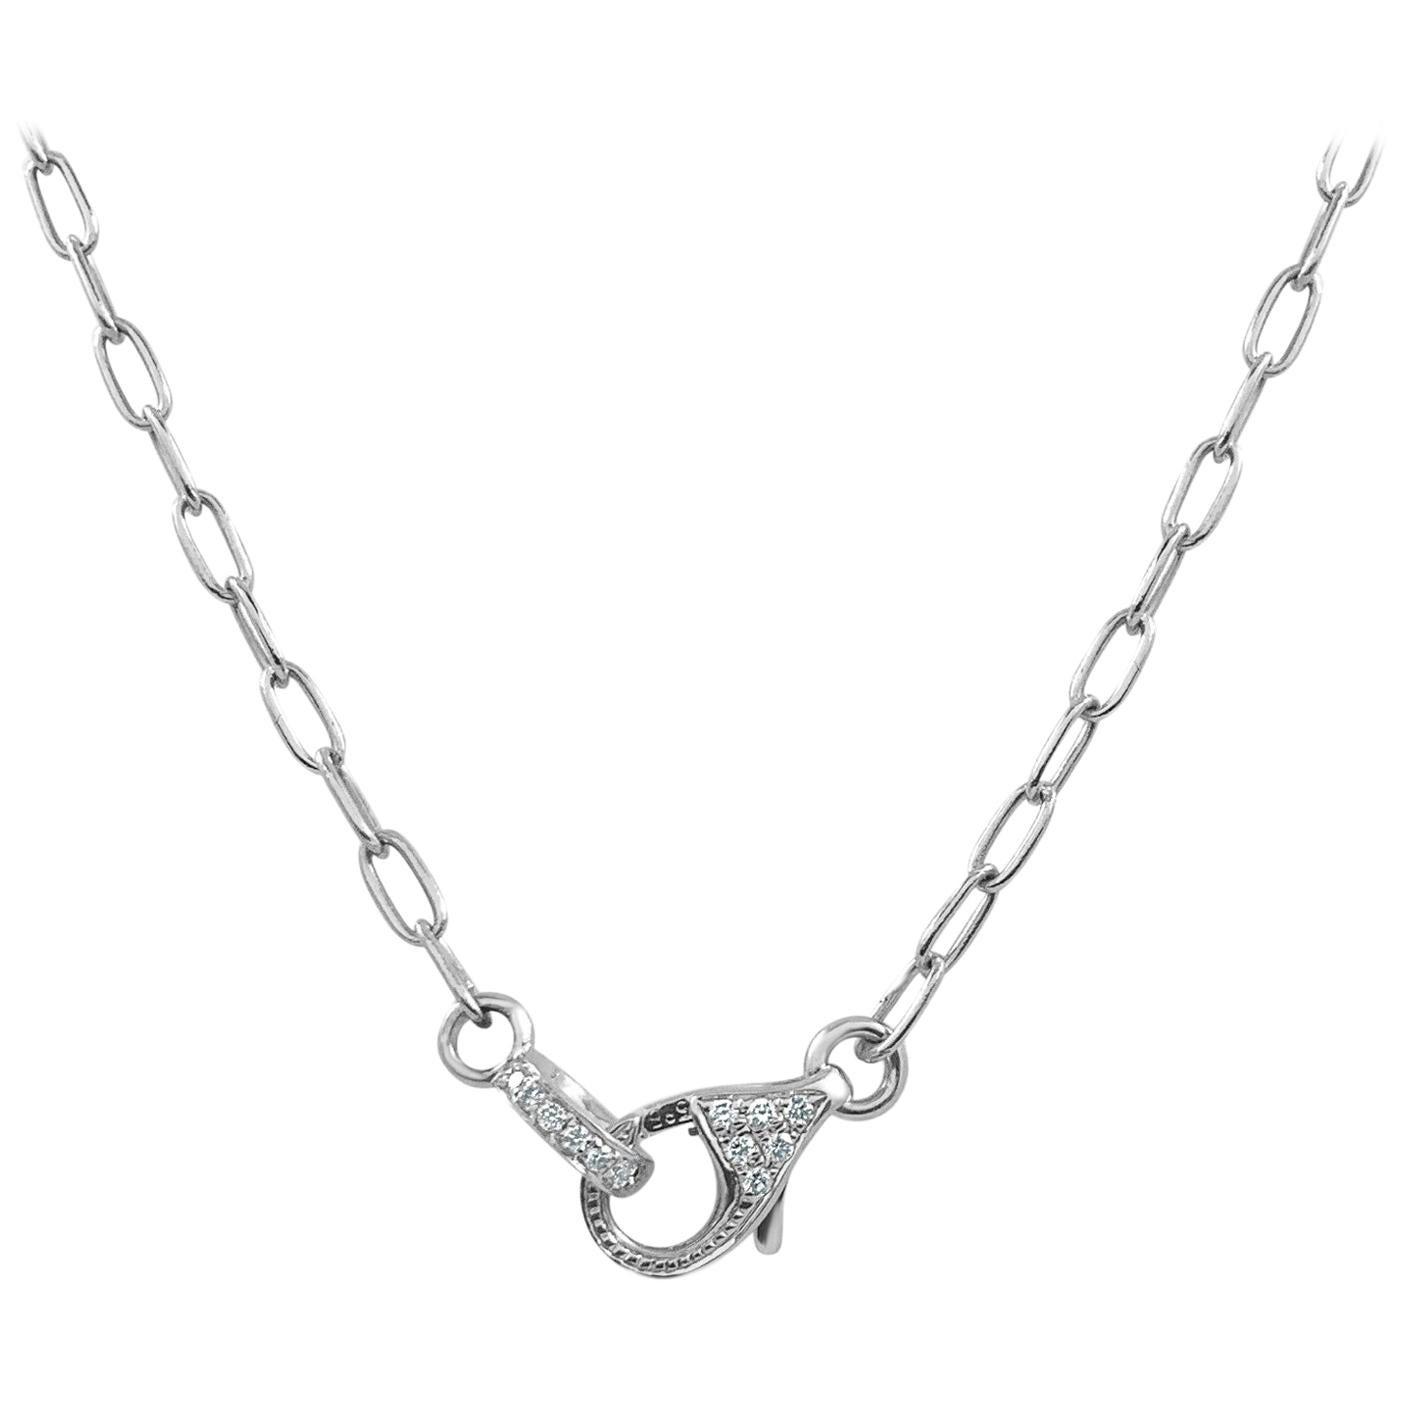 14 Karat White Gold 0.13 Carat Diamond Lobster Claw Link Chain Necklace